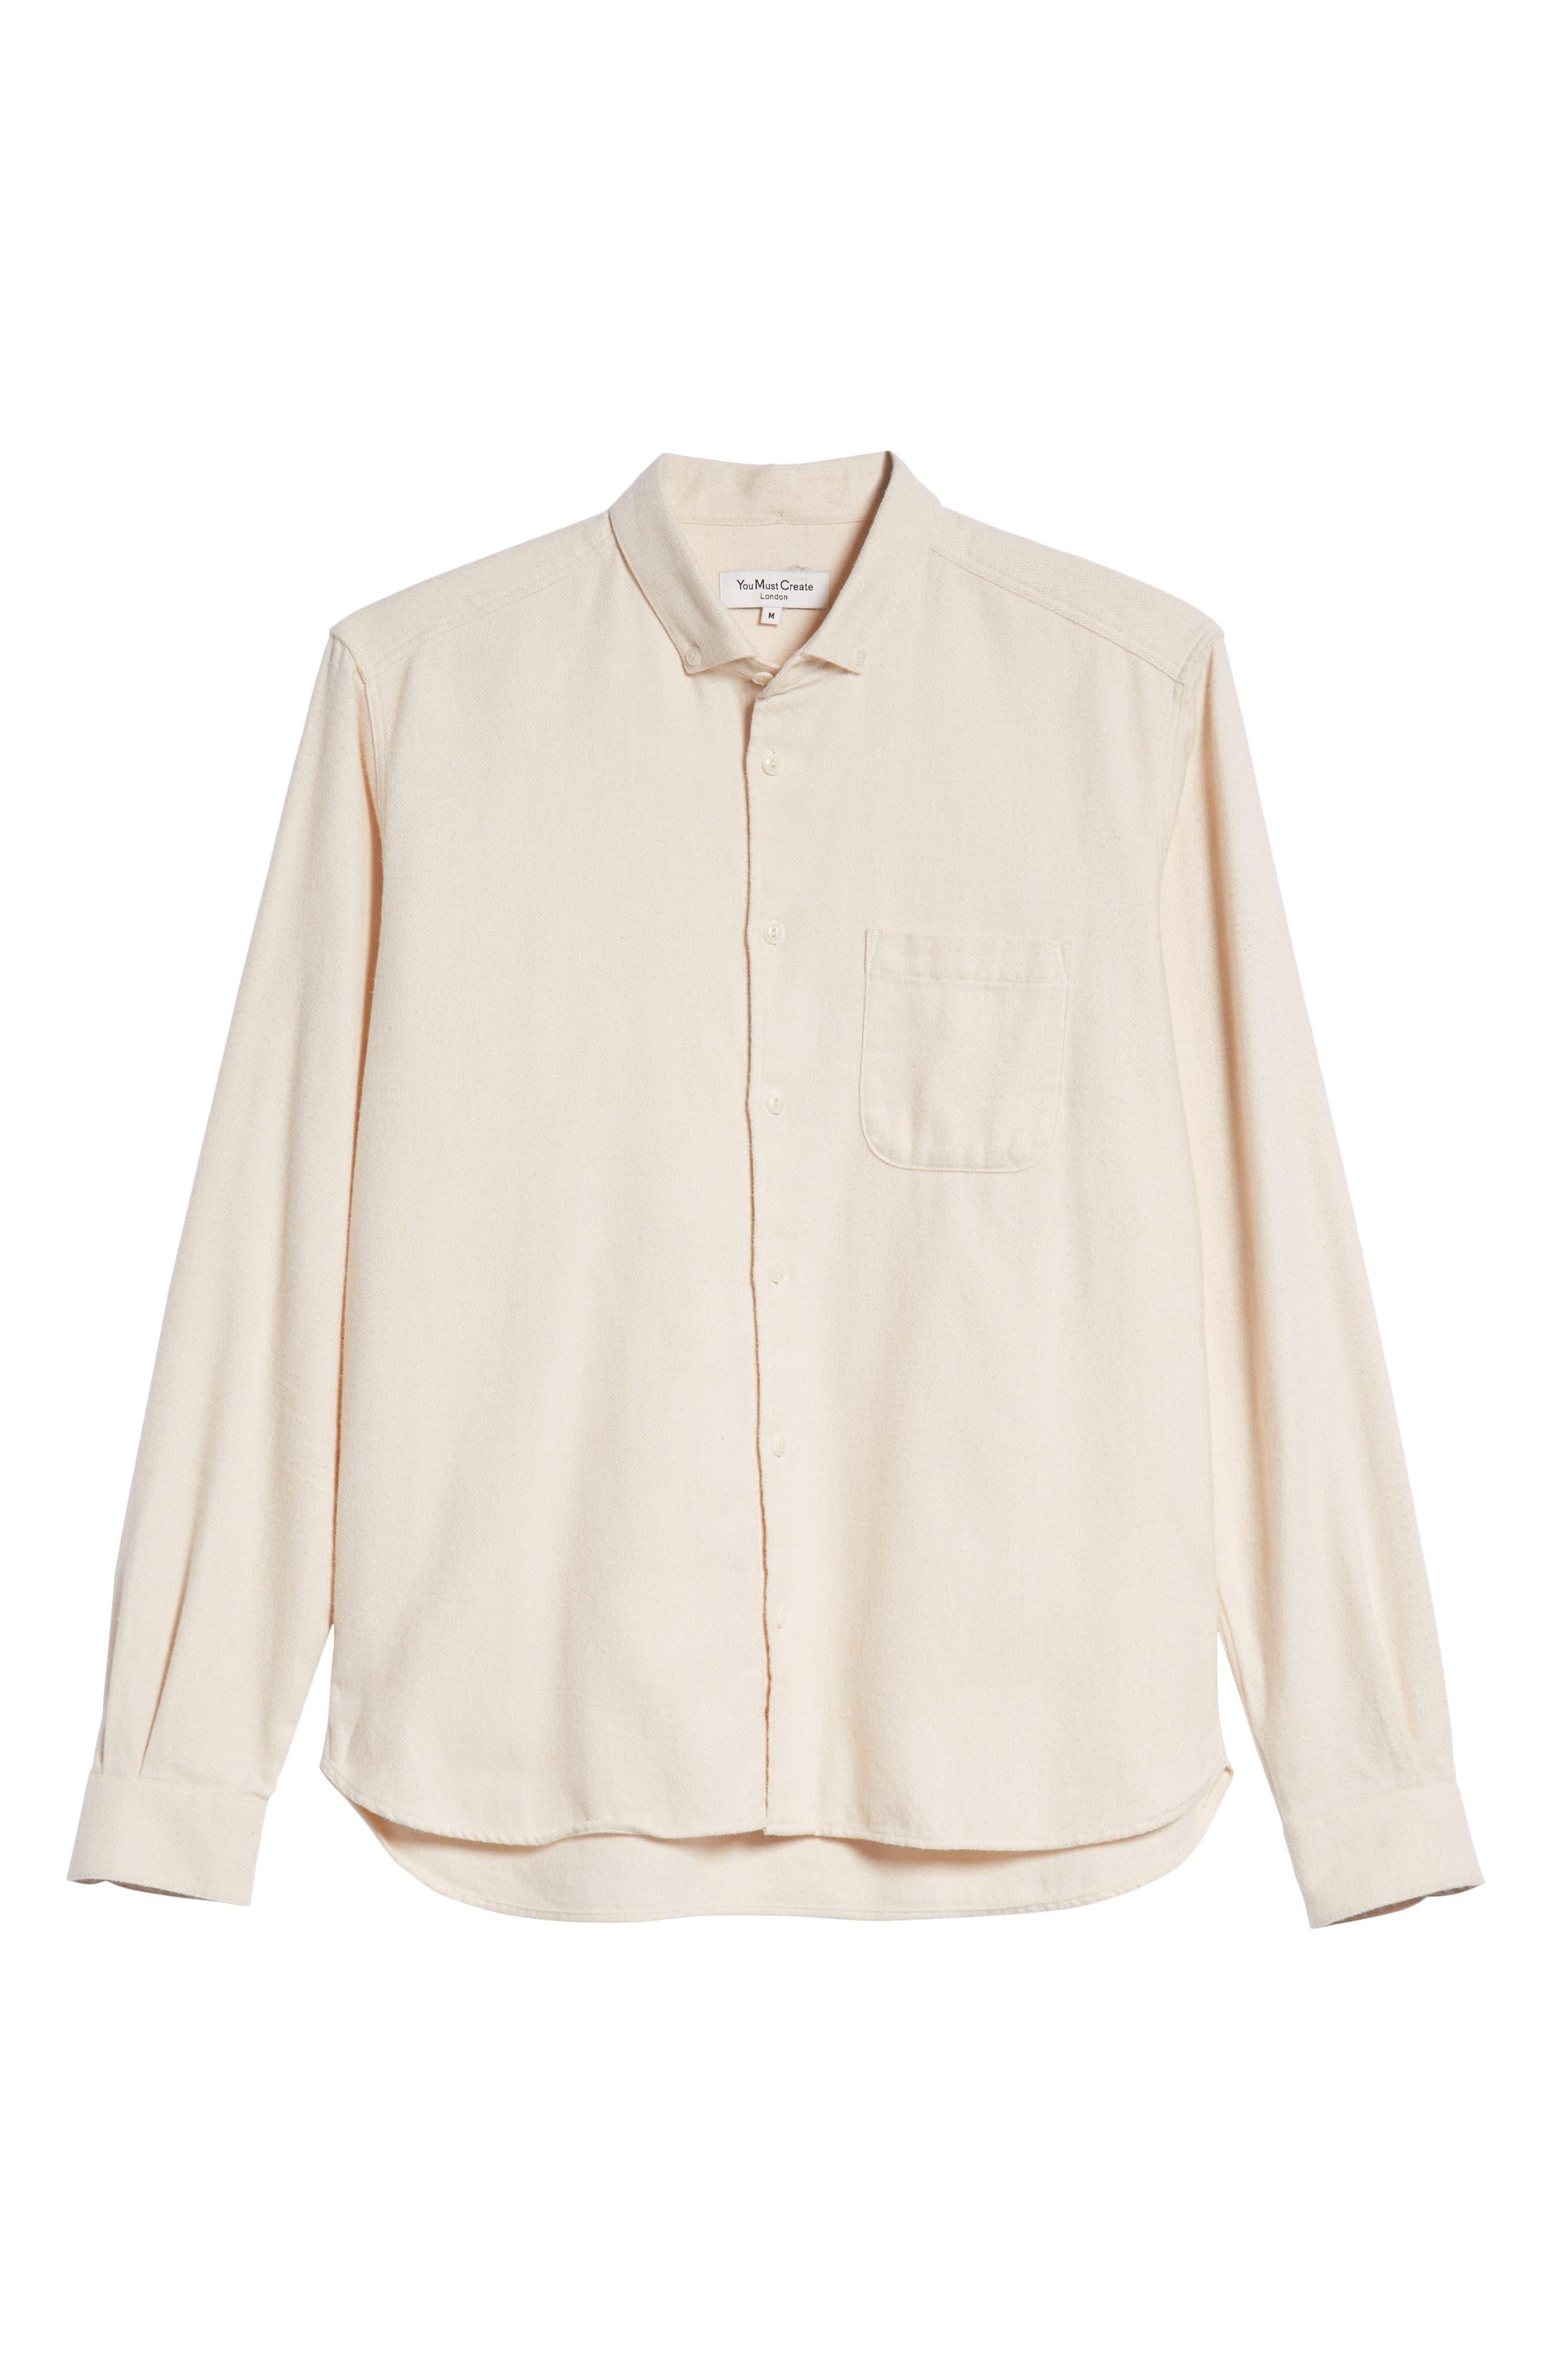 Marl Flannel Shirt,                             Alternate thumbnail 5, color,                             ECRU